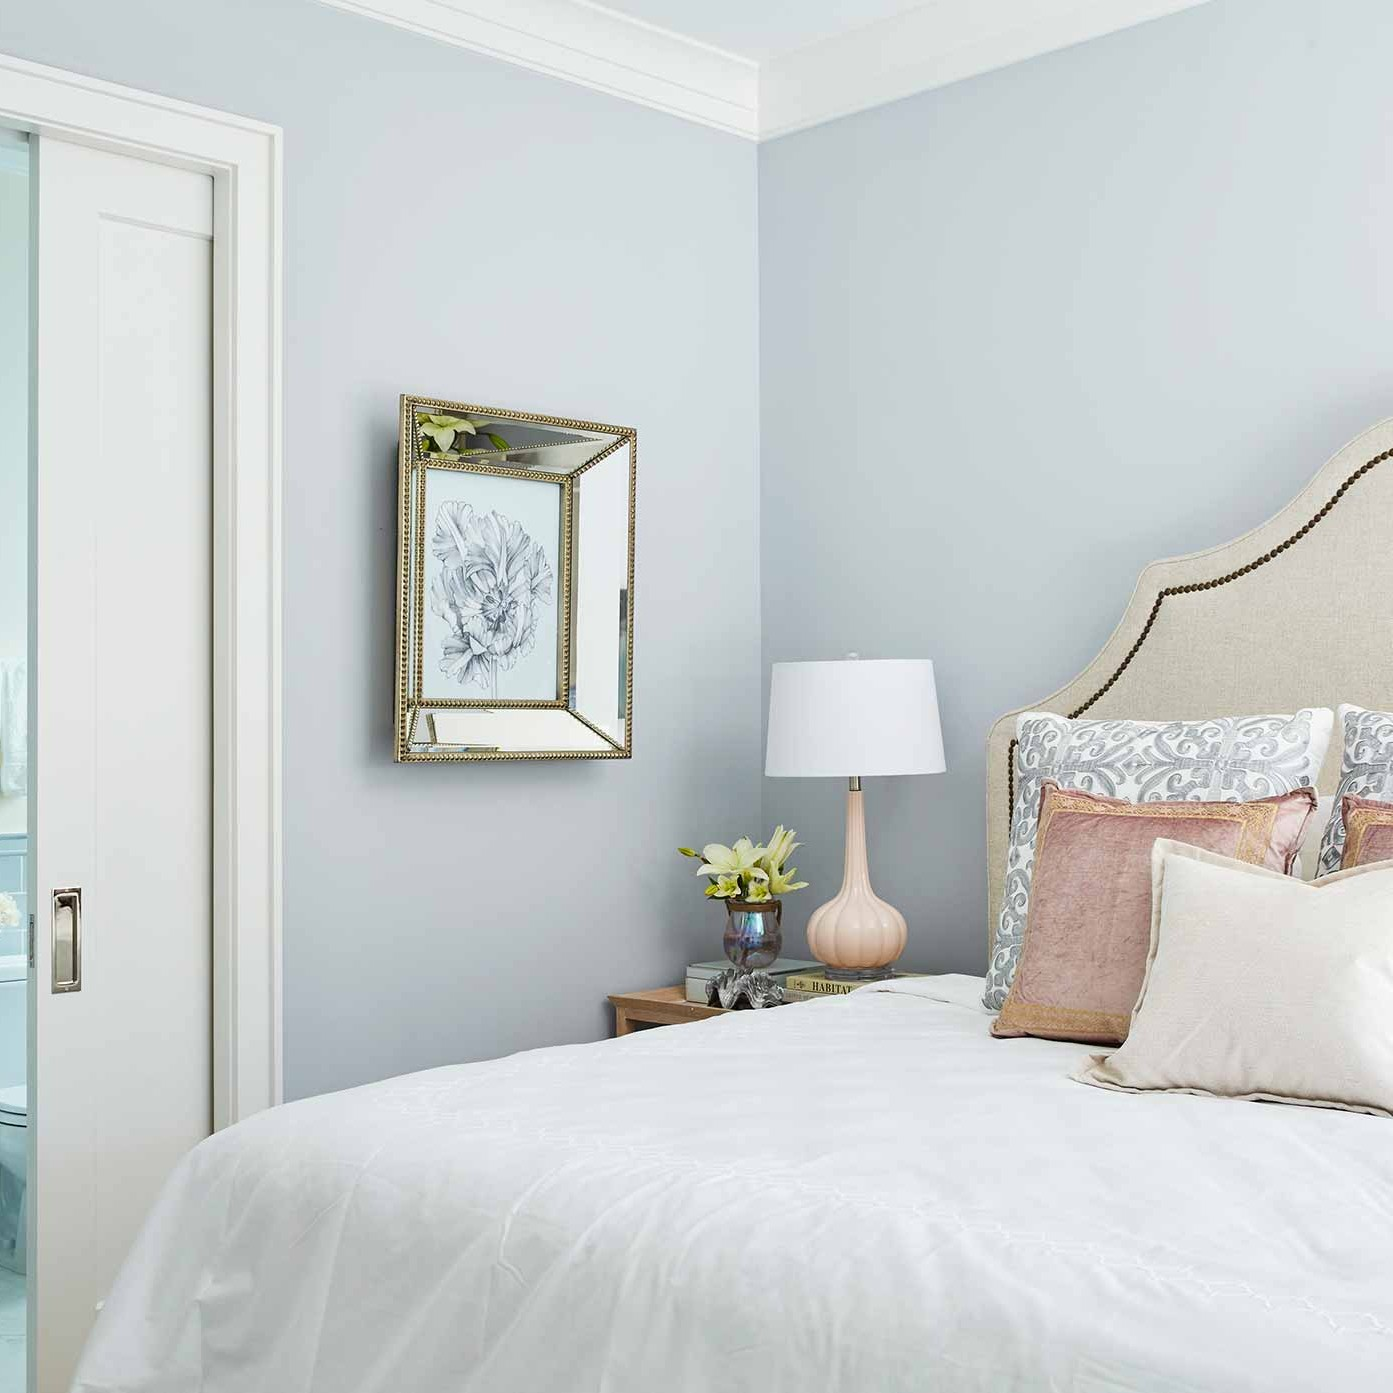 Beach style guest room interior design by Darci Hether New York